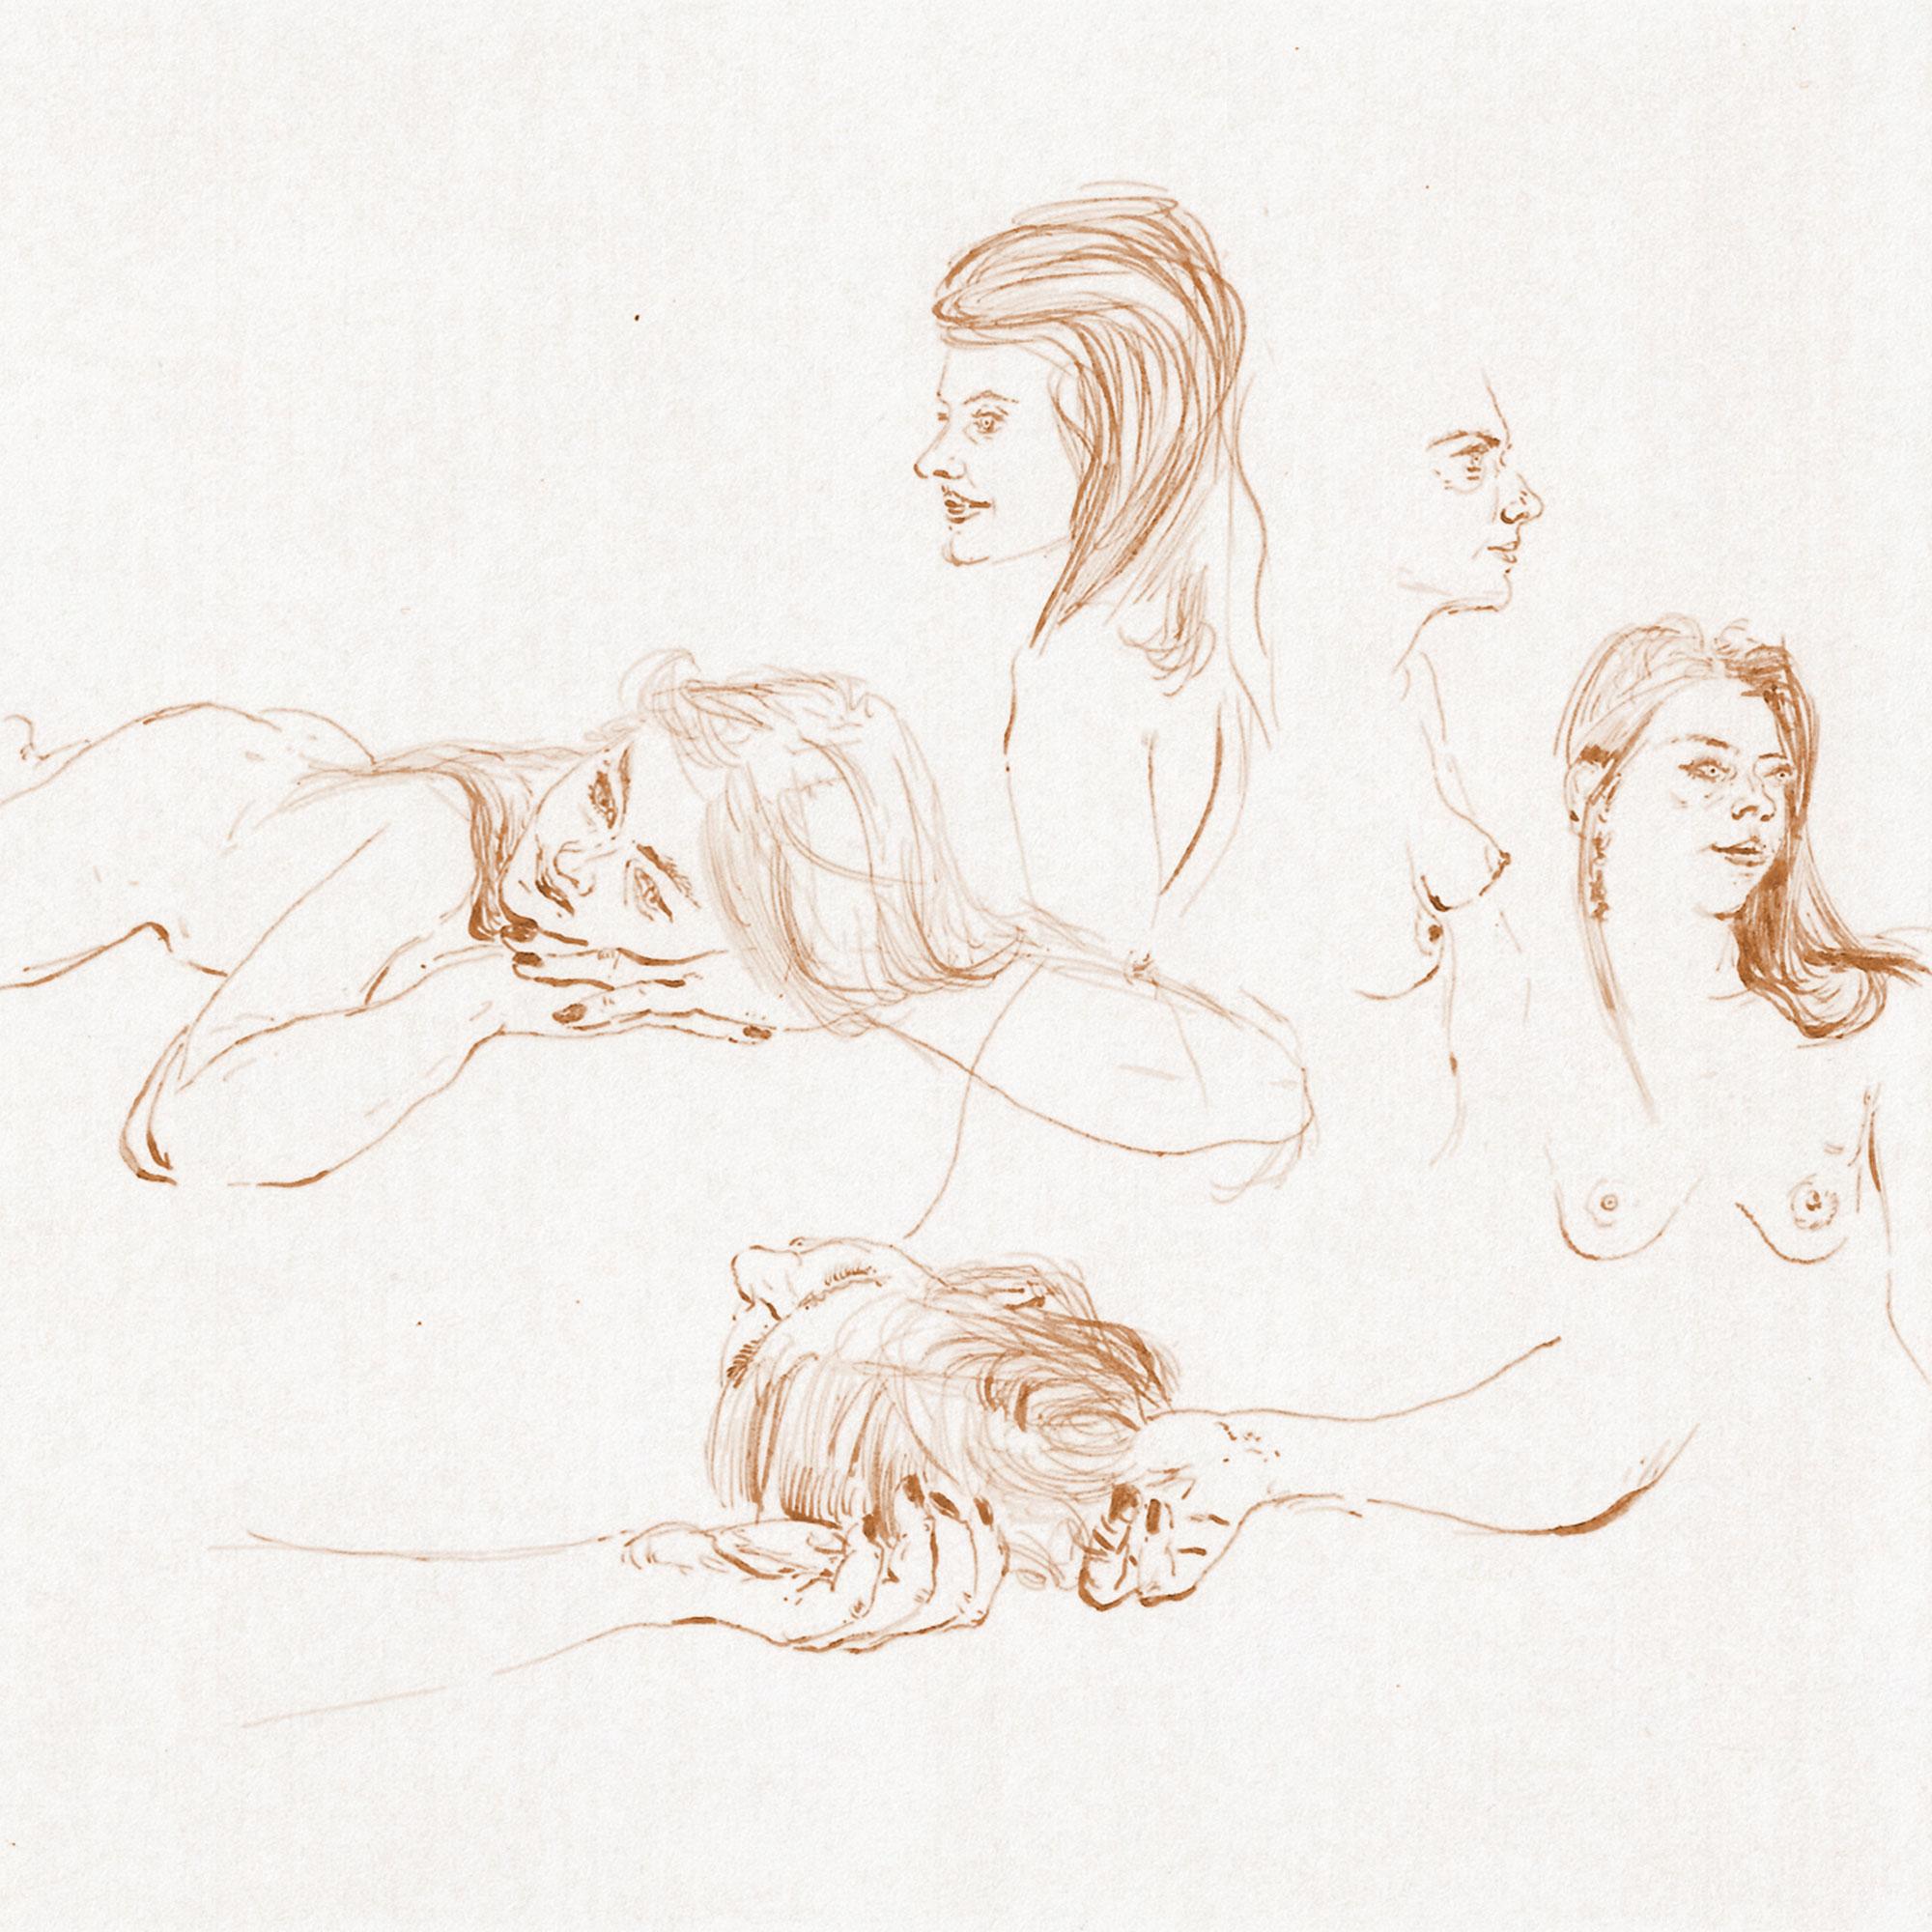 Women study 1 June 15